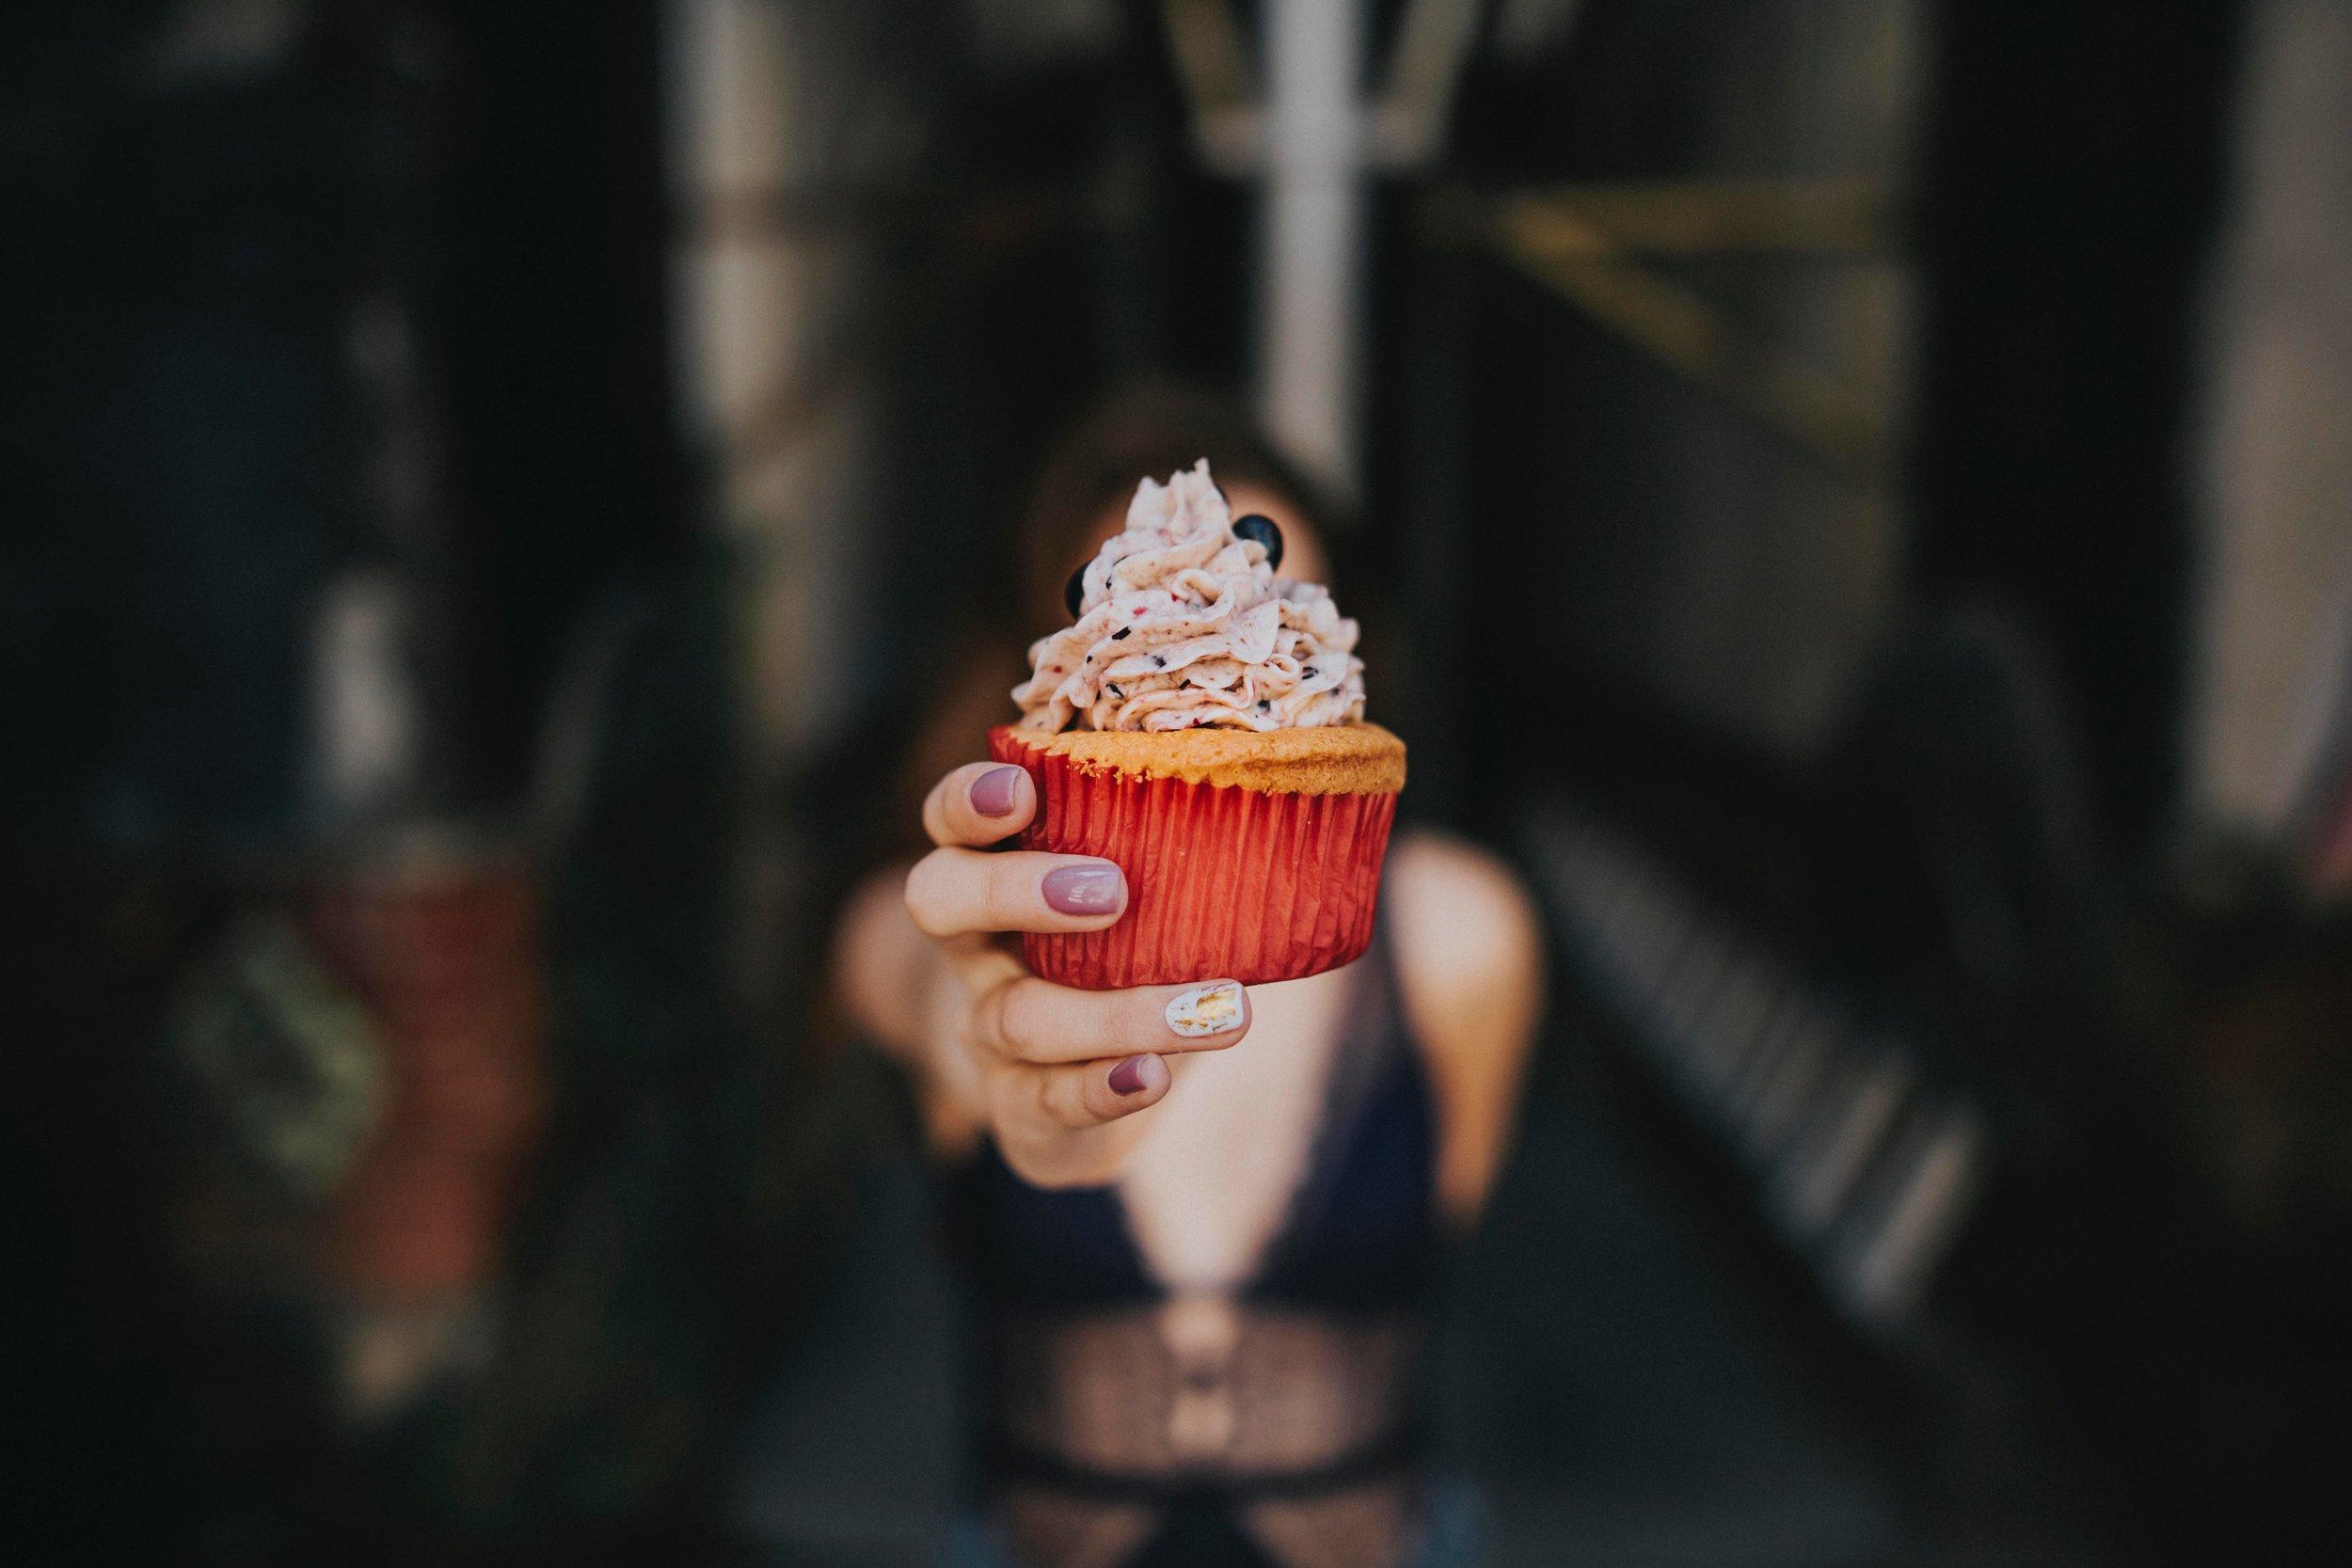 cupcake-delicious-dessert-2466047.jpg